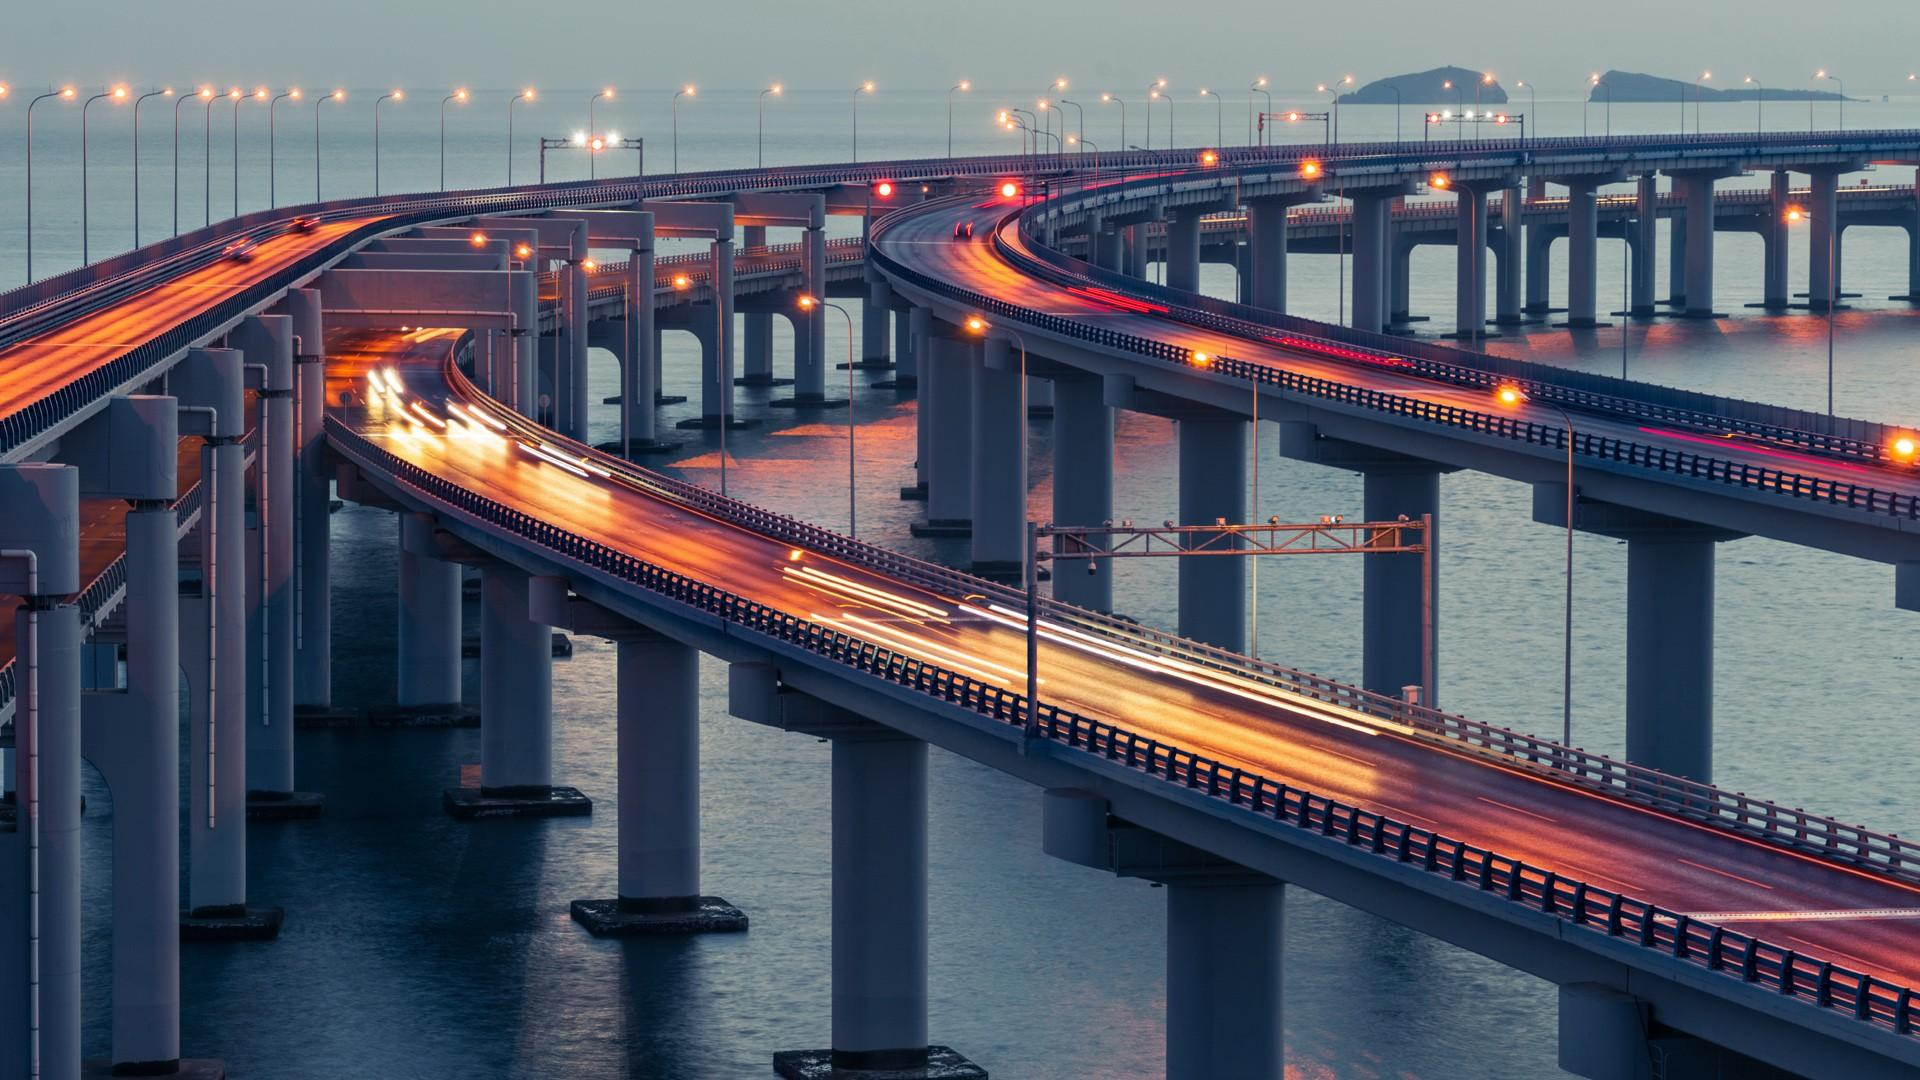 Cross-sea bridge in Dalian wallpaper